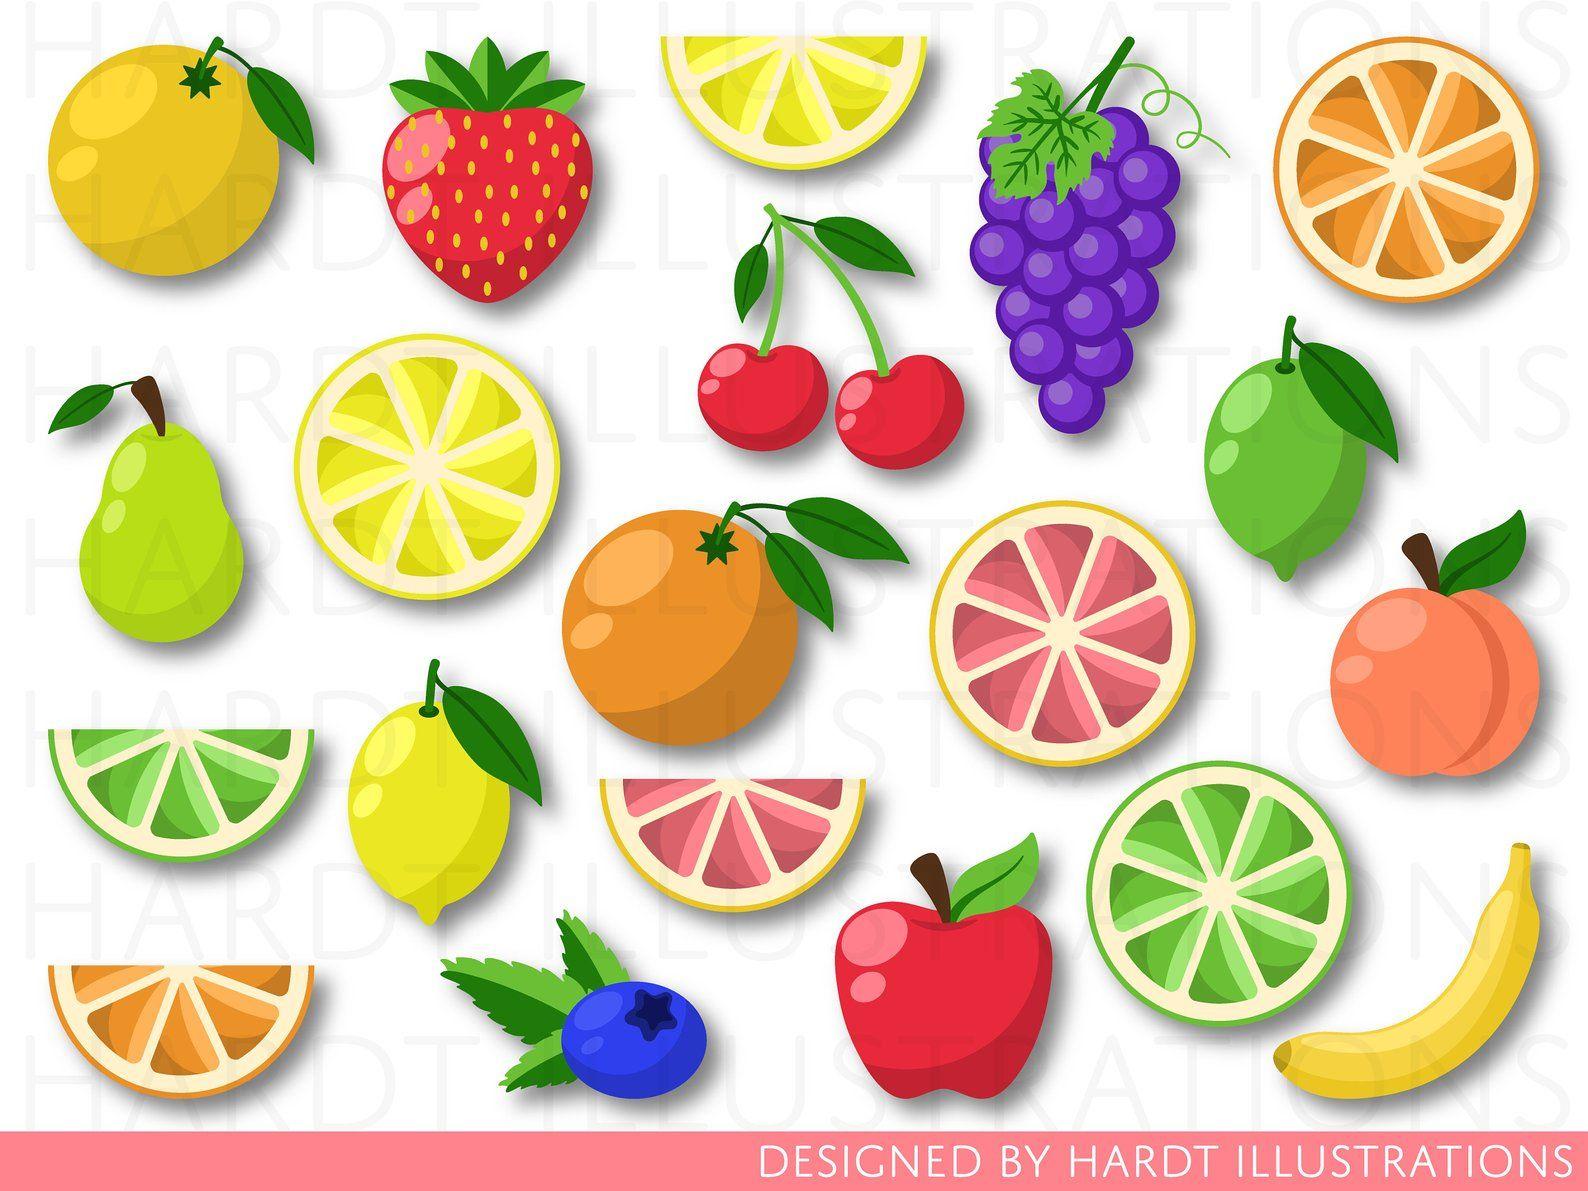 Fruit Clipart Fruits Clip Art Tutti Frutti Citrus Clipart Etsy Lebensmittel Clipart Sommer Party Einladungen Kirschen